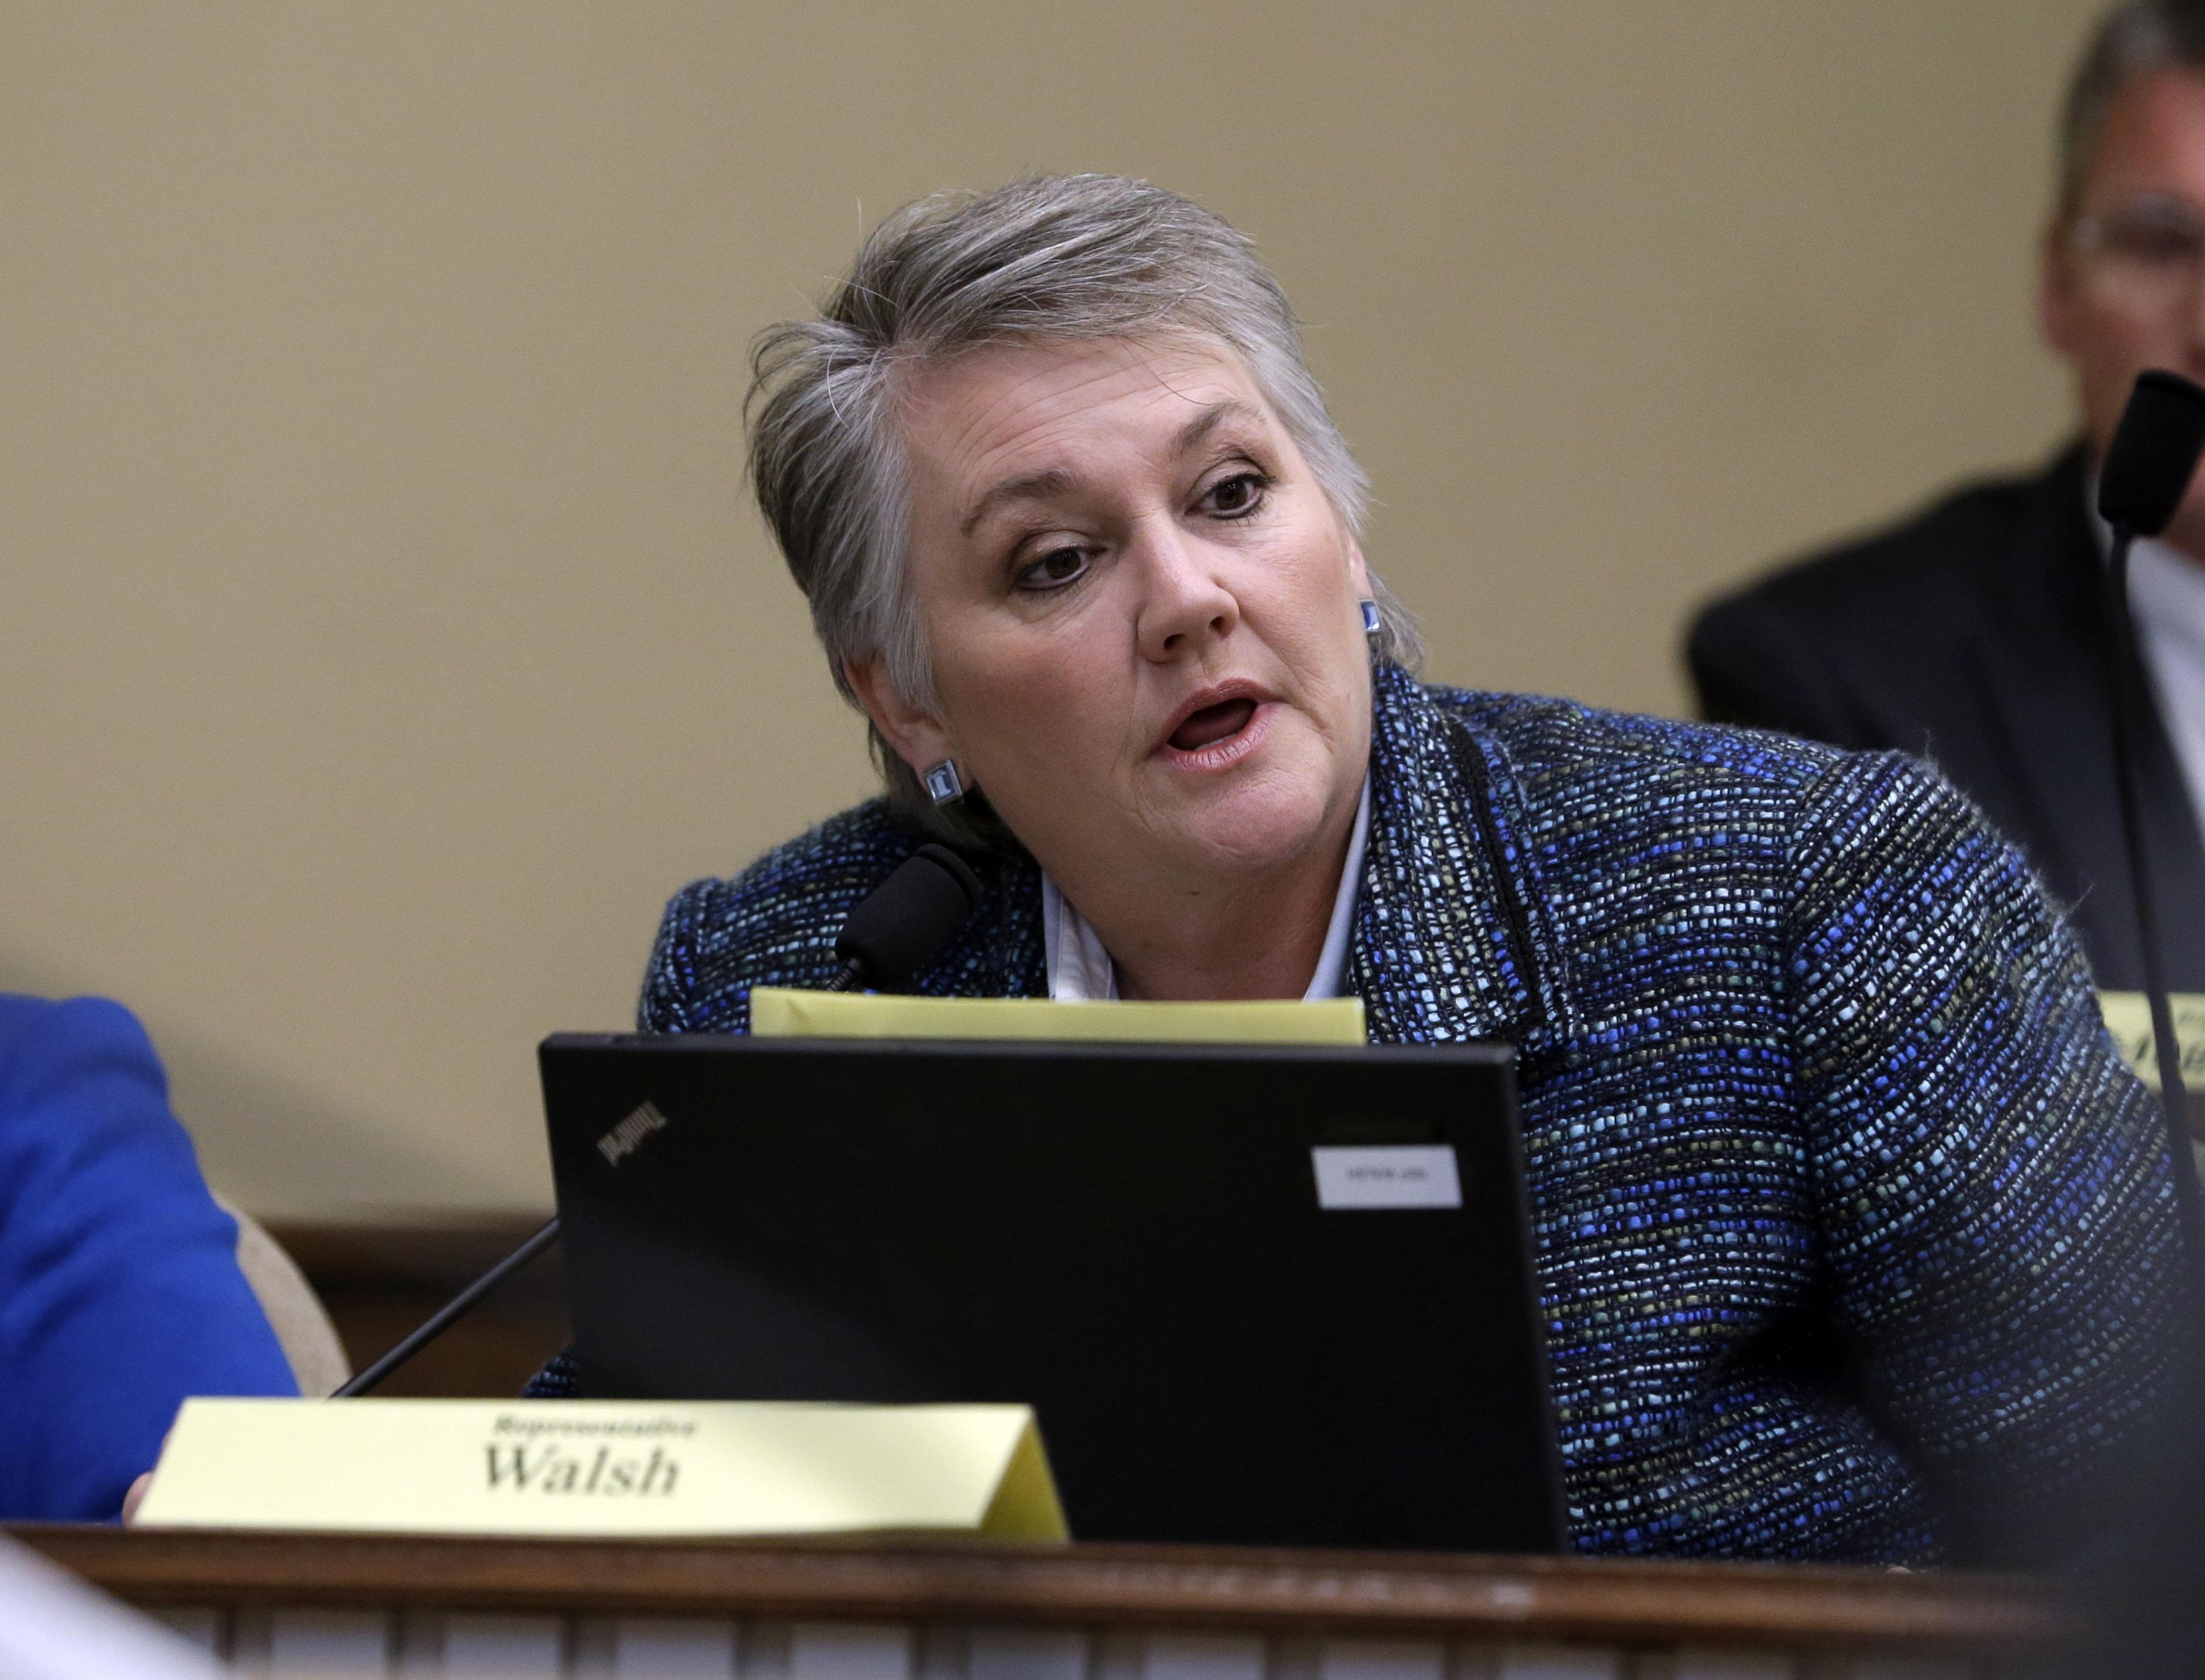 Washington GOP Senator Blasted For Saying Some Nurses Play Cards During Work